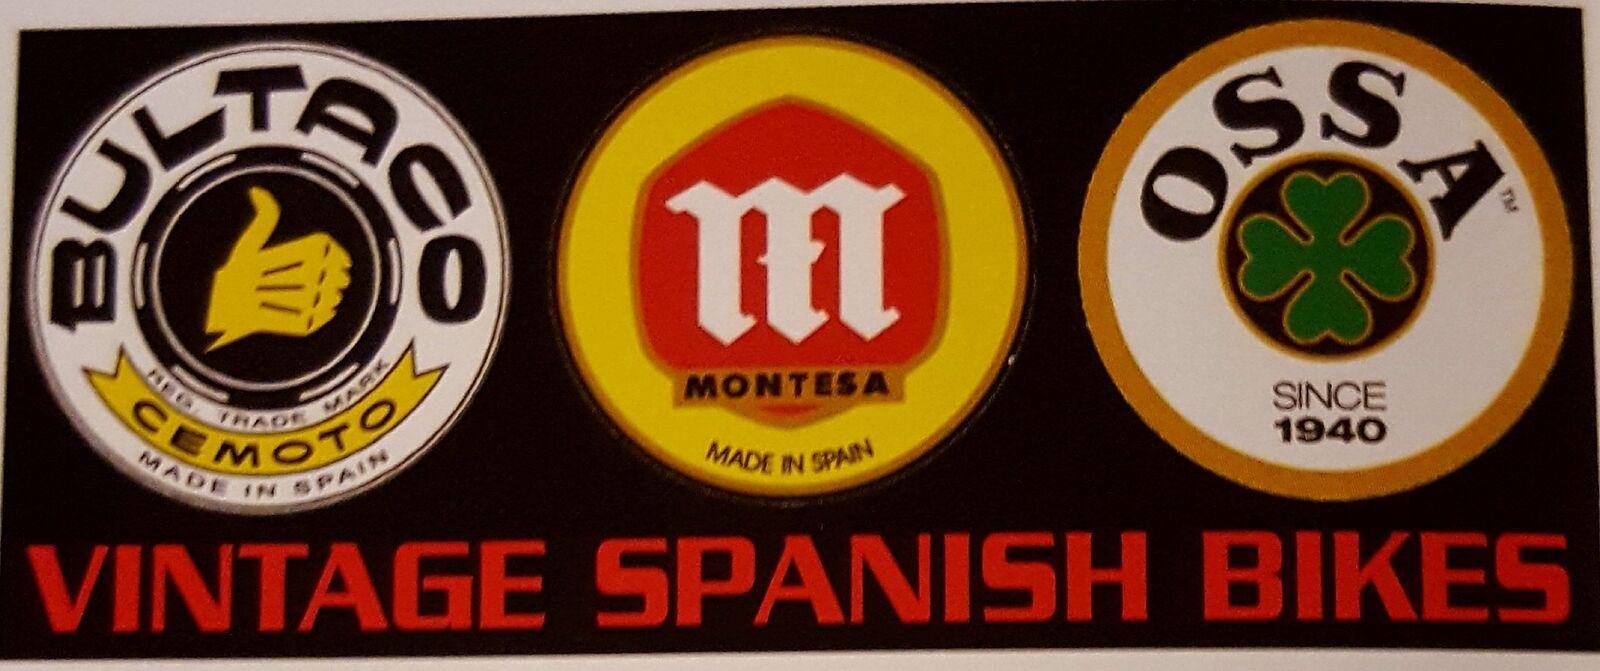 VINTAGE SPANISH BIKES